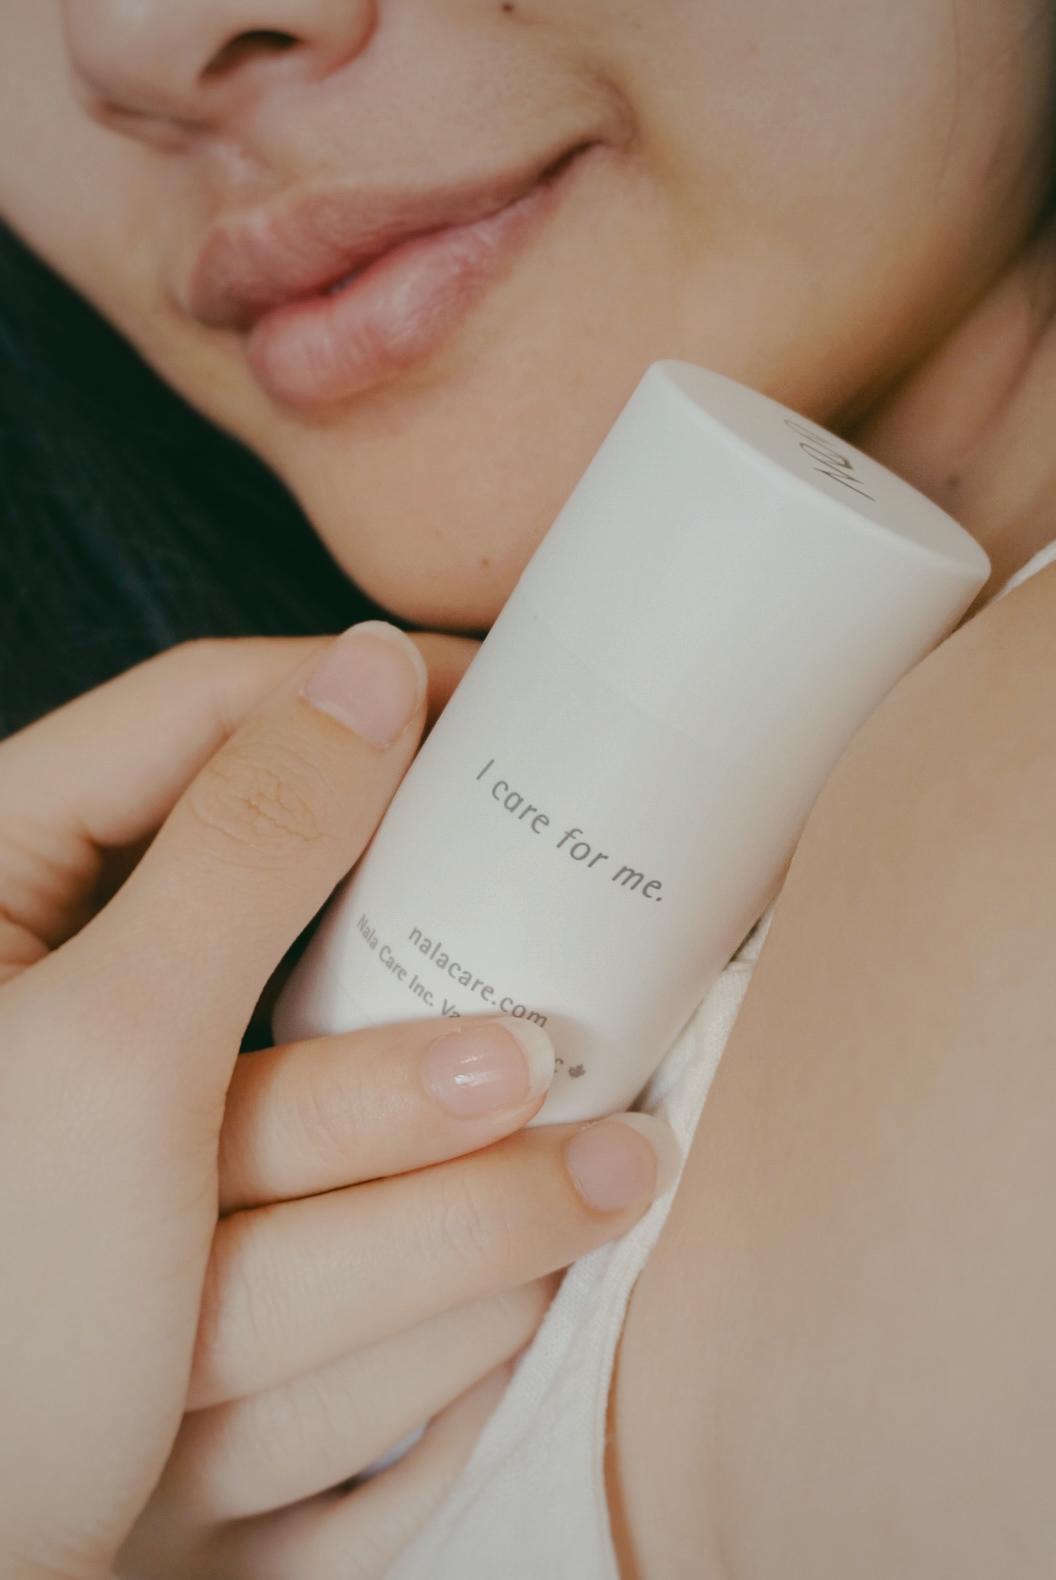 Nala Care free-from deodorant